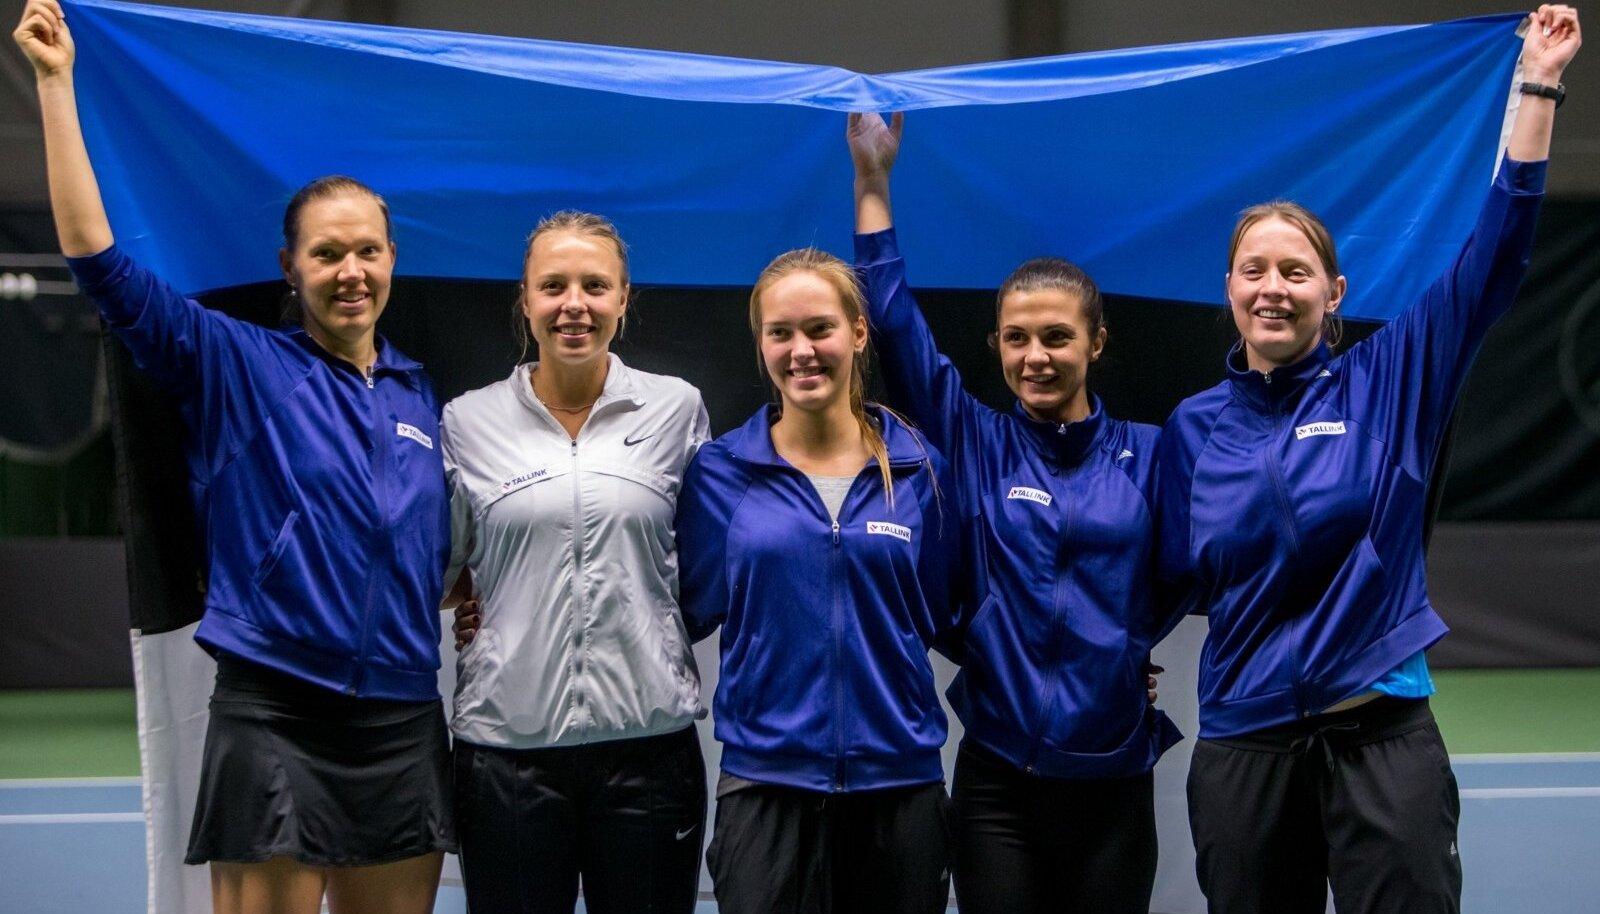 Eesti Fed Cupi naiskond 2015. aastal: Kaia Kanepi, Anett Kontaveit, Valeria Gorlats, Julia Skripnik ja kapten Maret Ani.